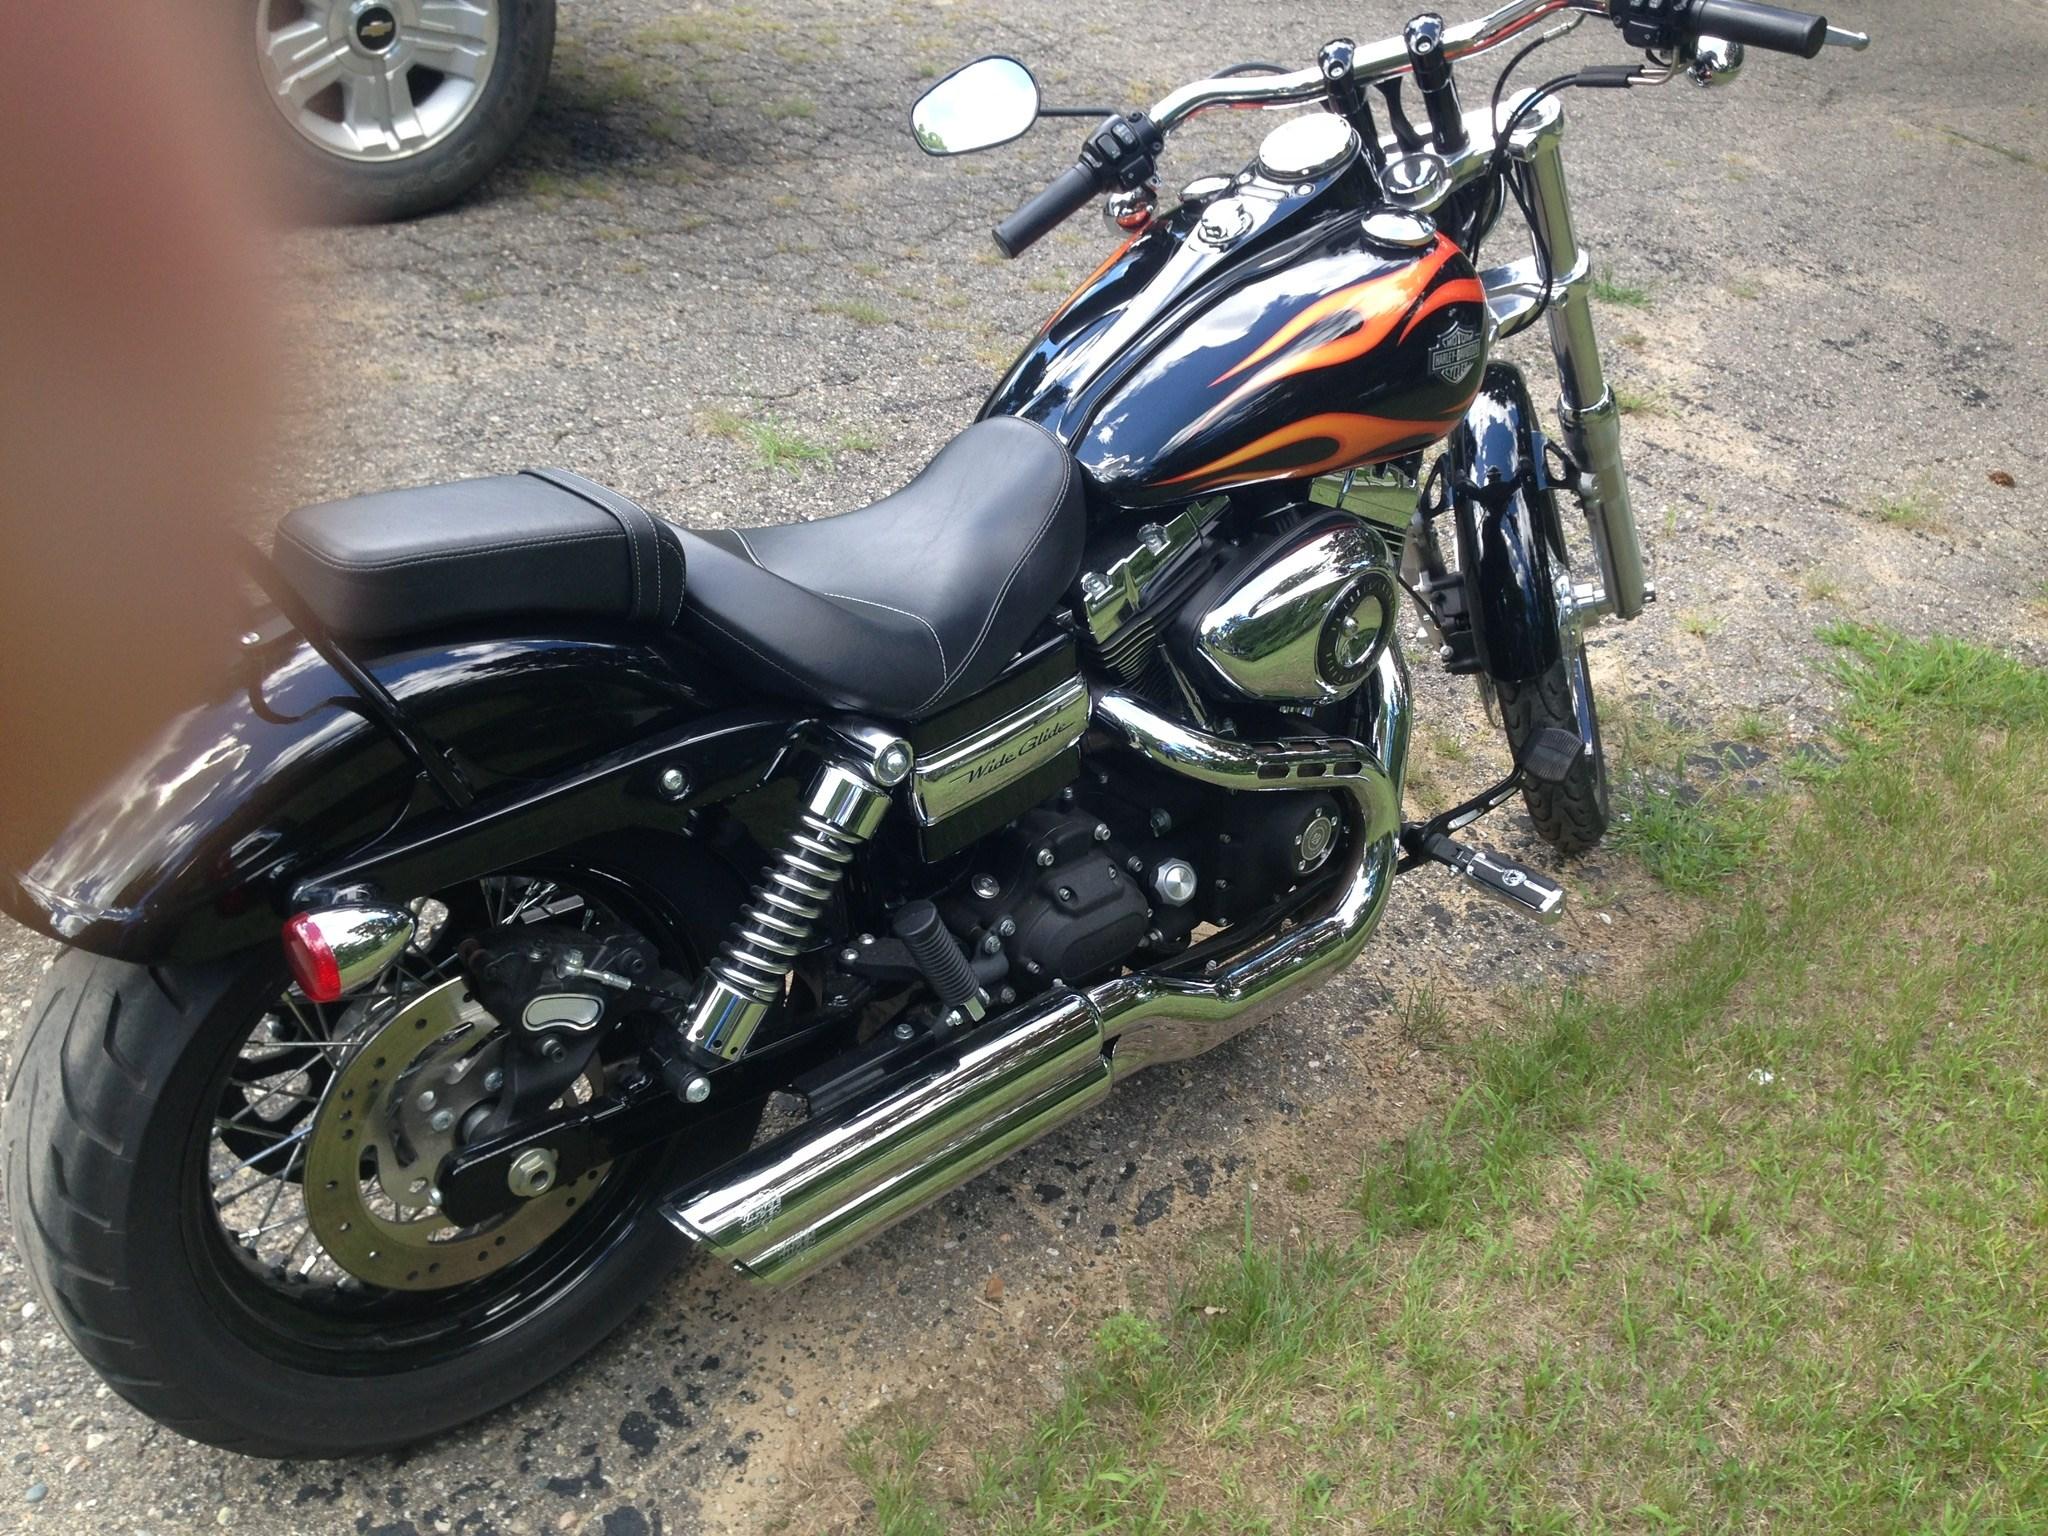 Dyna For Sale Woodstock Ga >> 2011 Harley-Davidson® FXDWG Dyna® Wide Glide® (Black), Lake Orion, Michigan (710788 ...